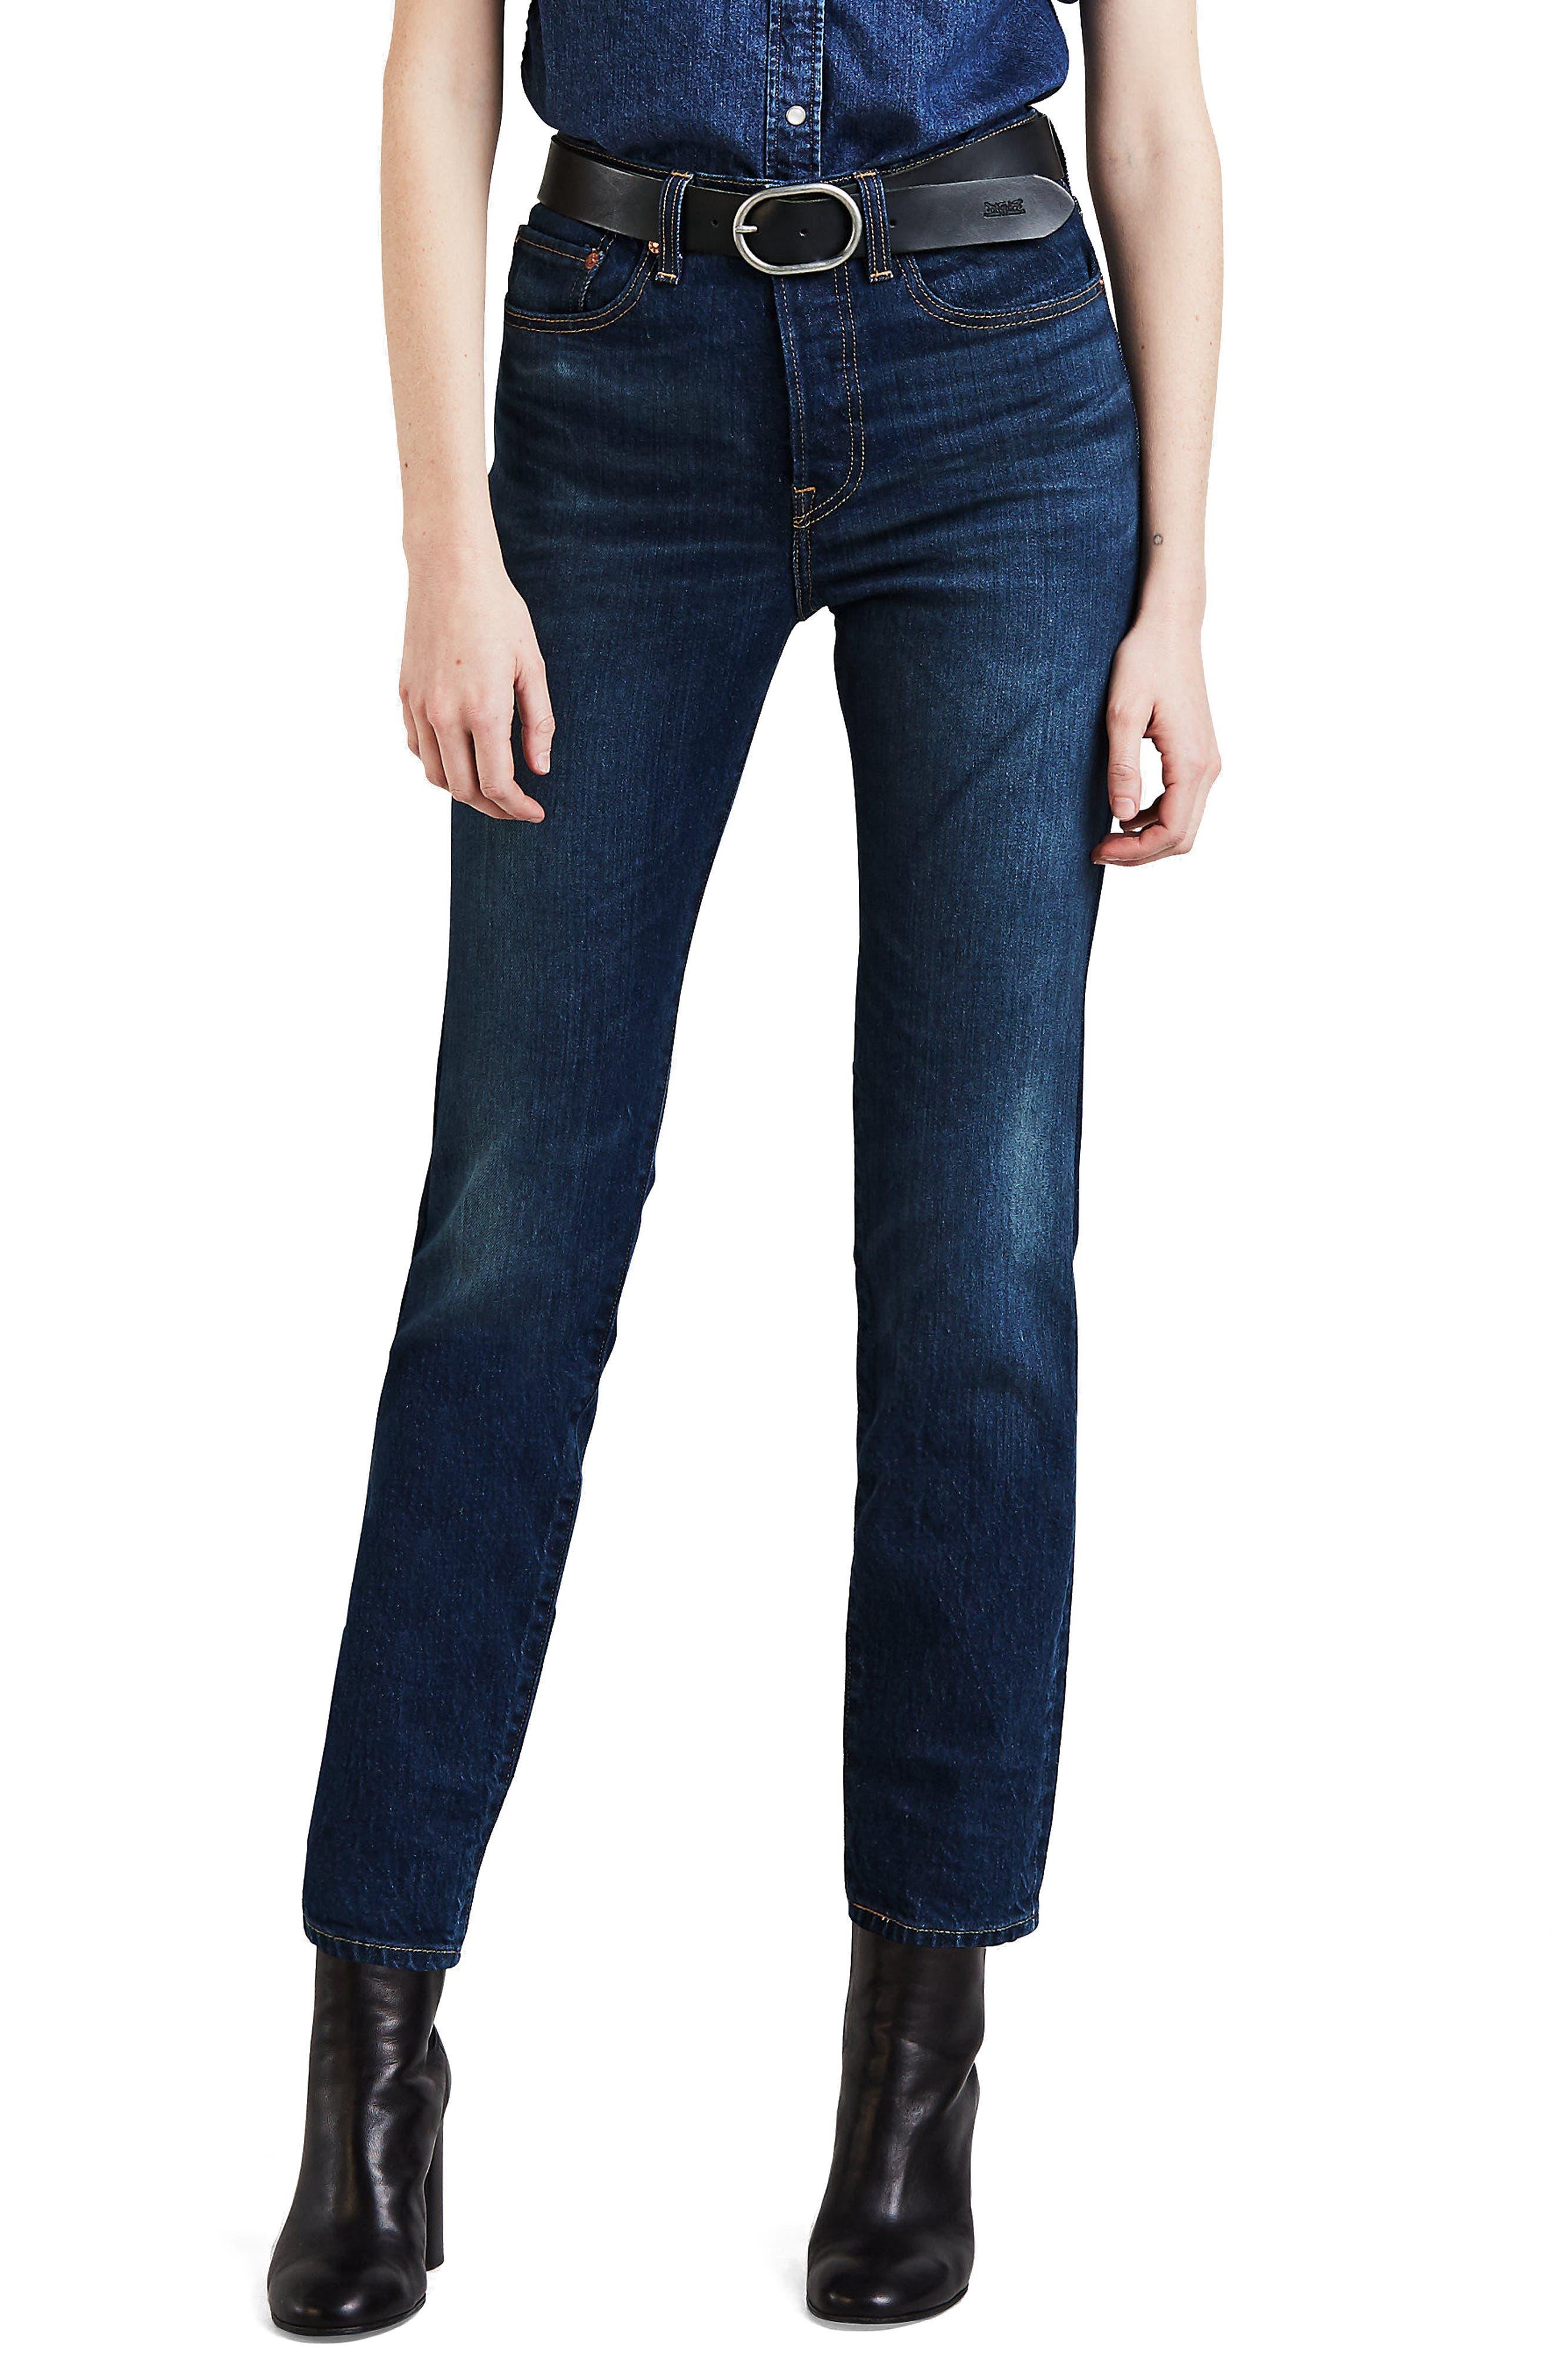 LEVI'S<SUP>®</SUP>, Wedgie Icon Fit High Waist Crop Jeans, Main thumbnail 1, color, AUTHENTIC FAVORITE